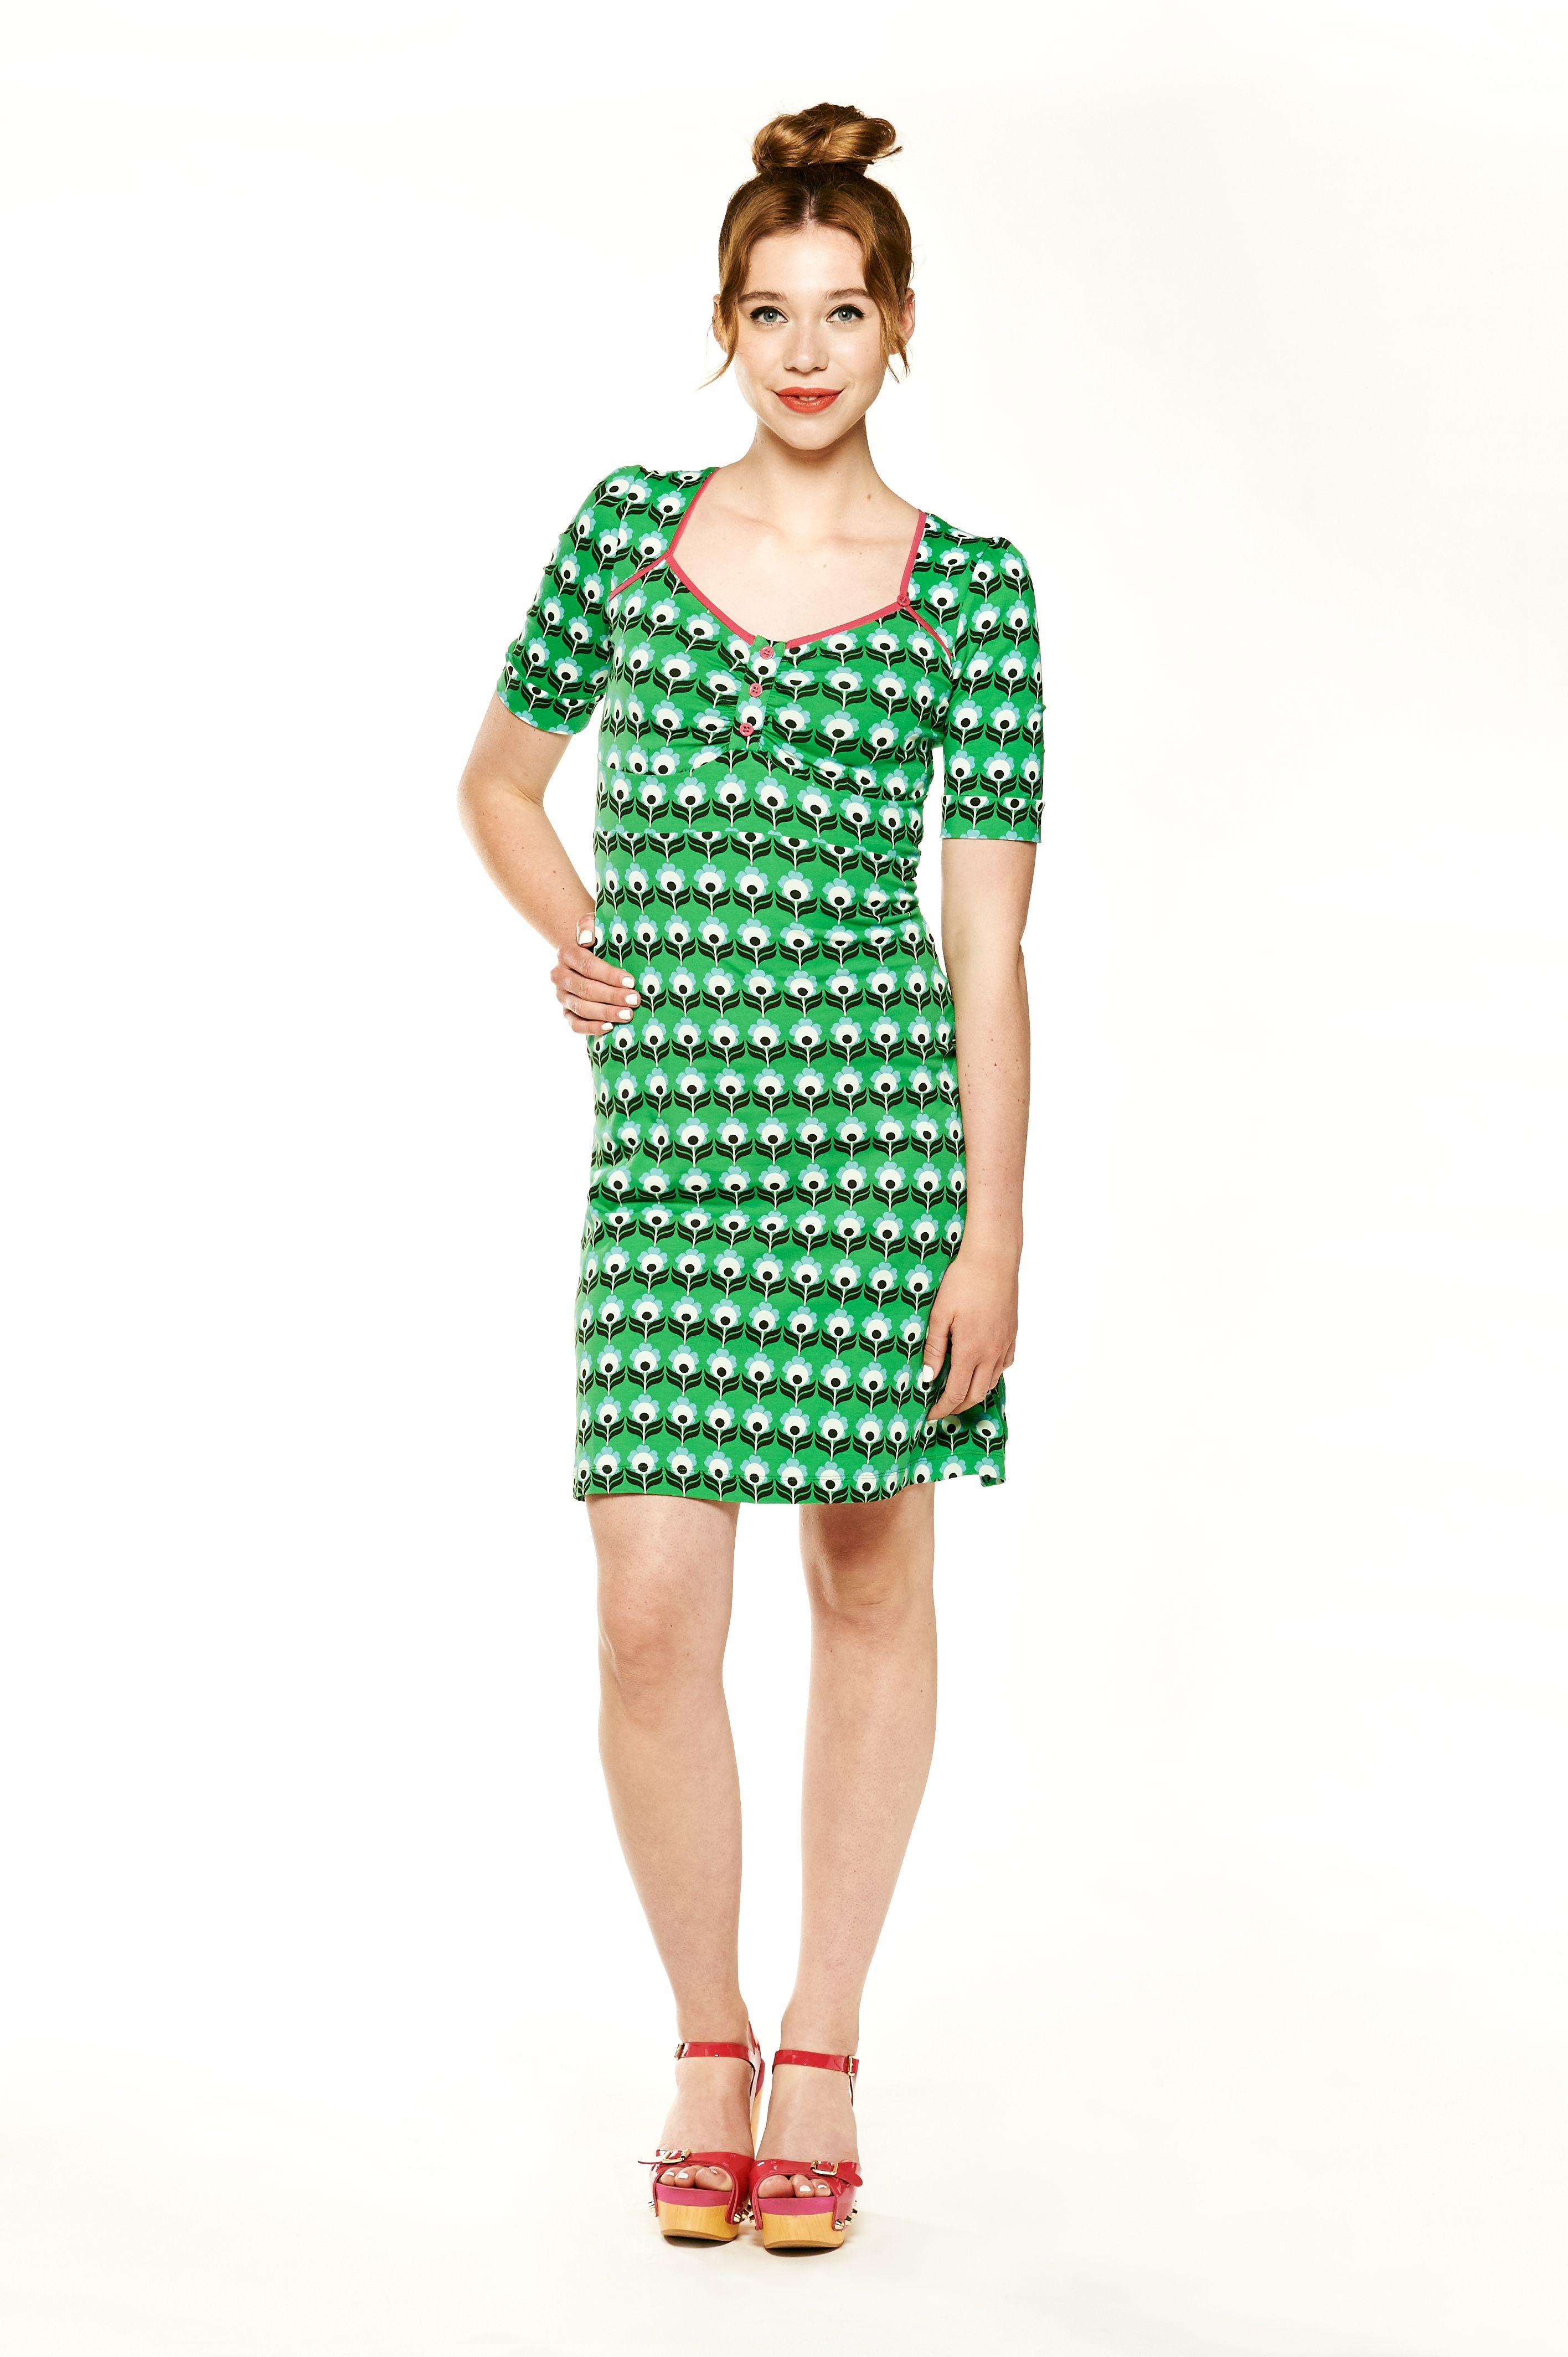 75407df74d30ec Tante betsy dress Peacock Green